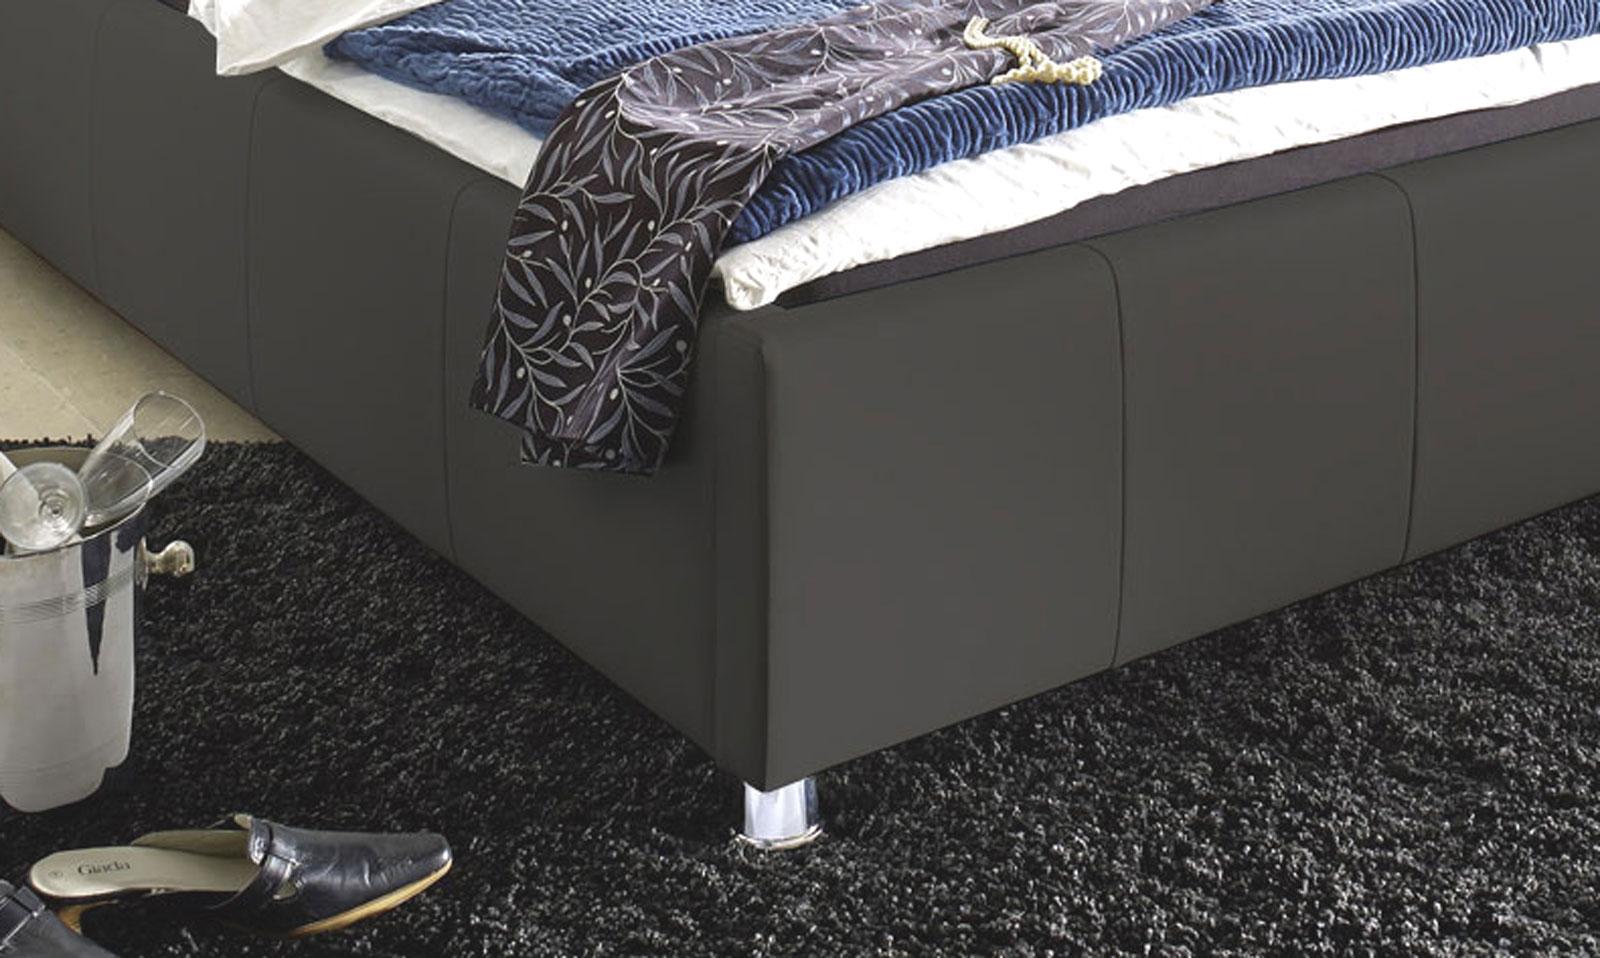 sam® bett polsterbett jugendbett grau 100 x 200 cm kira, Hause deko